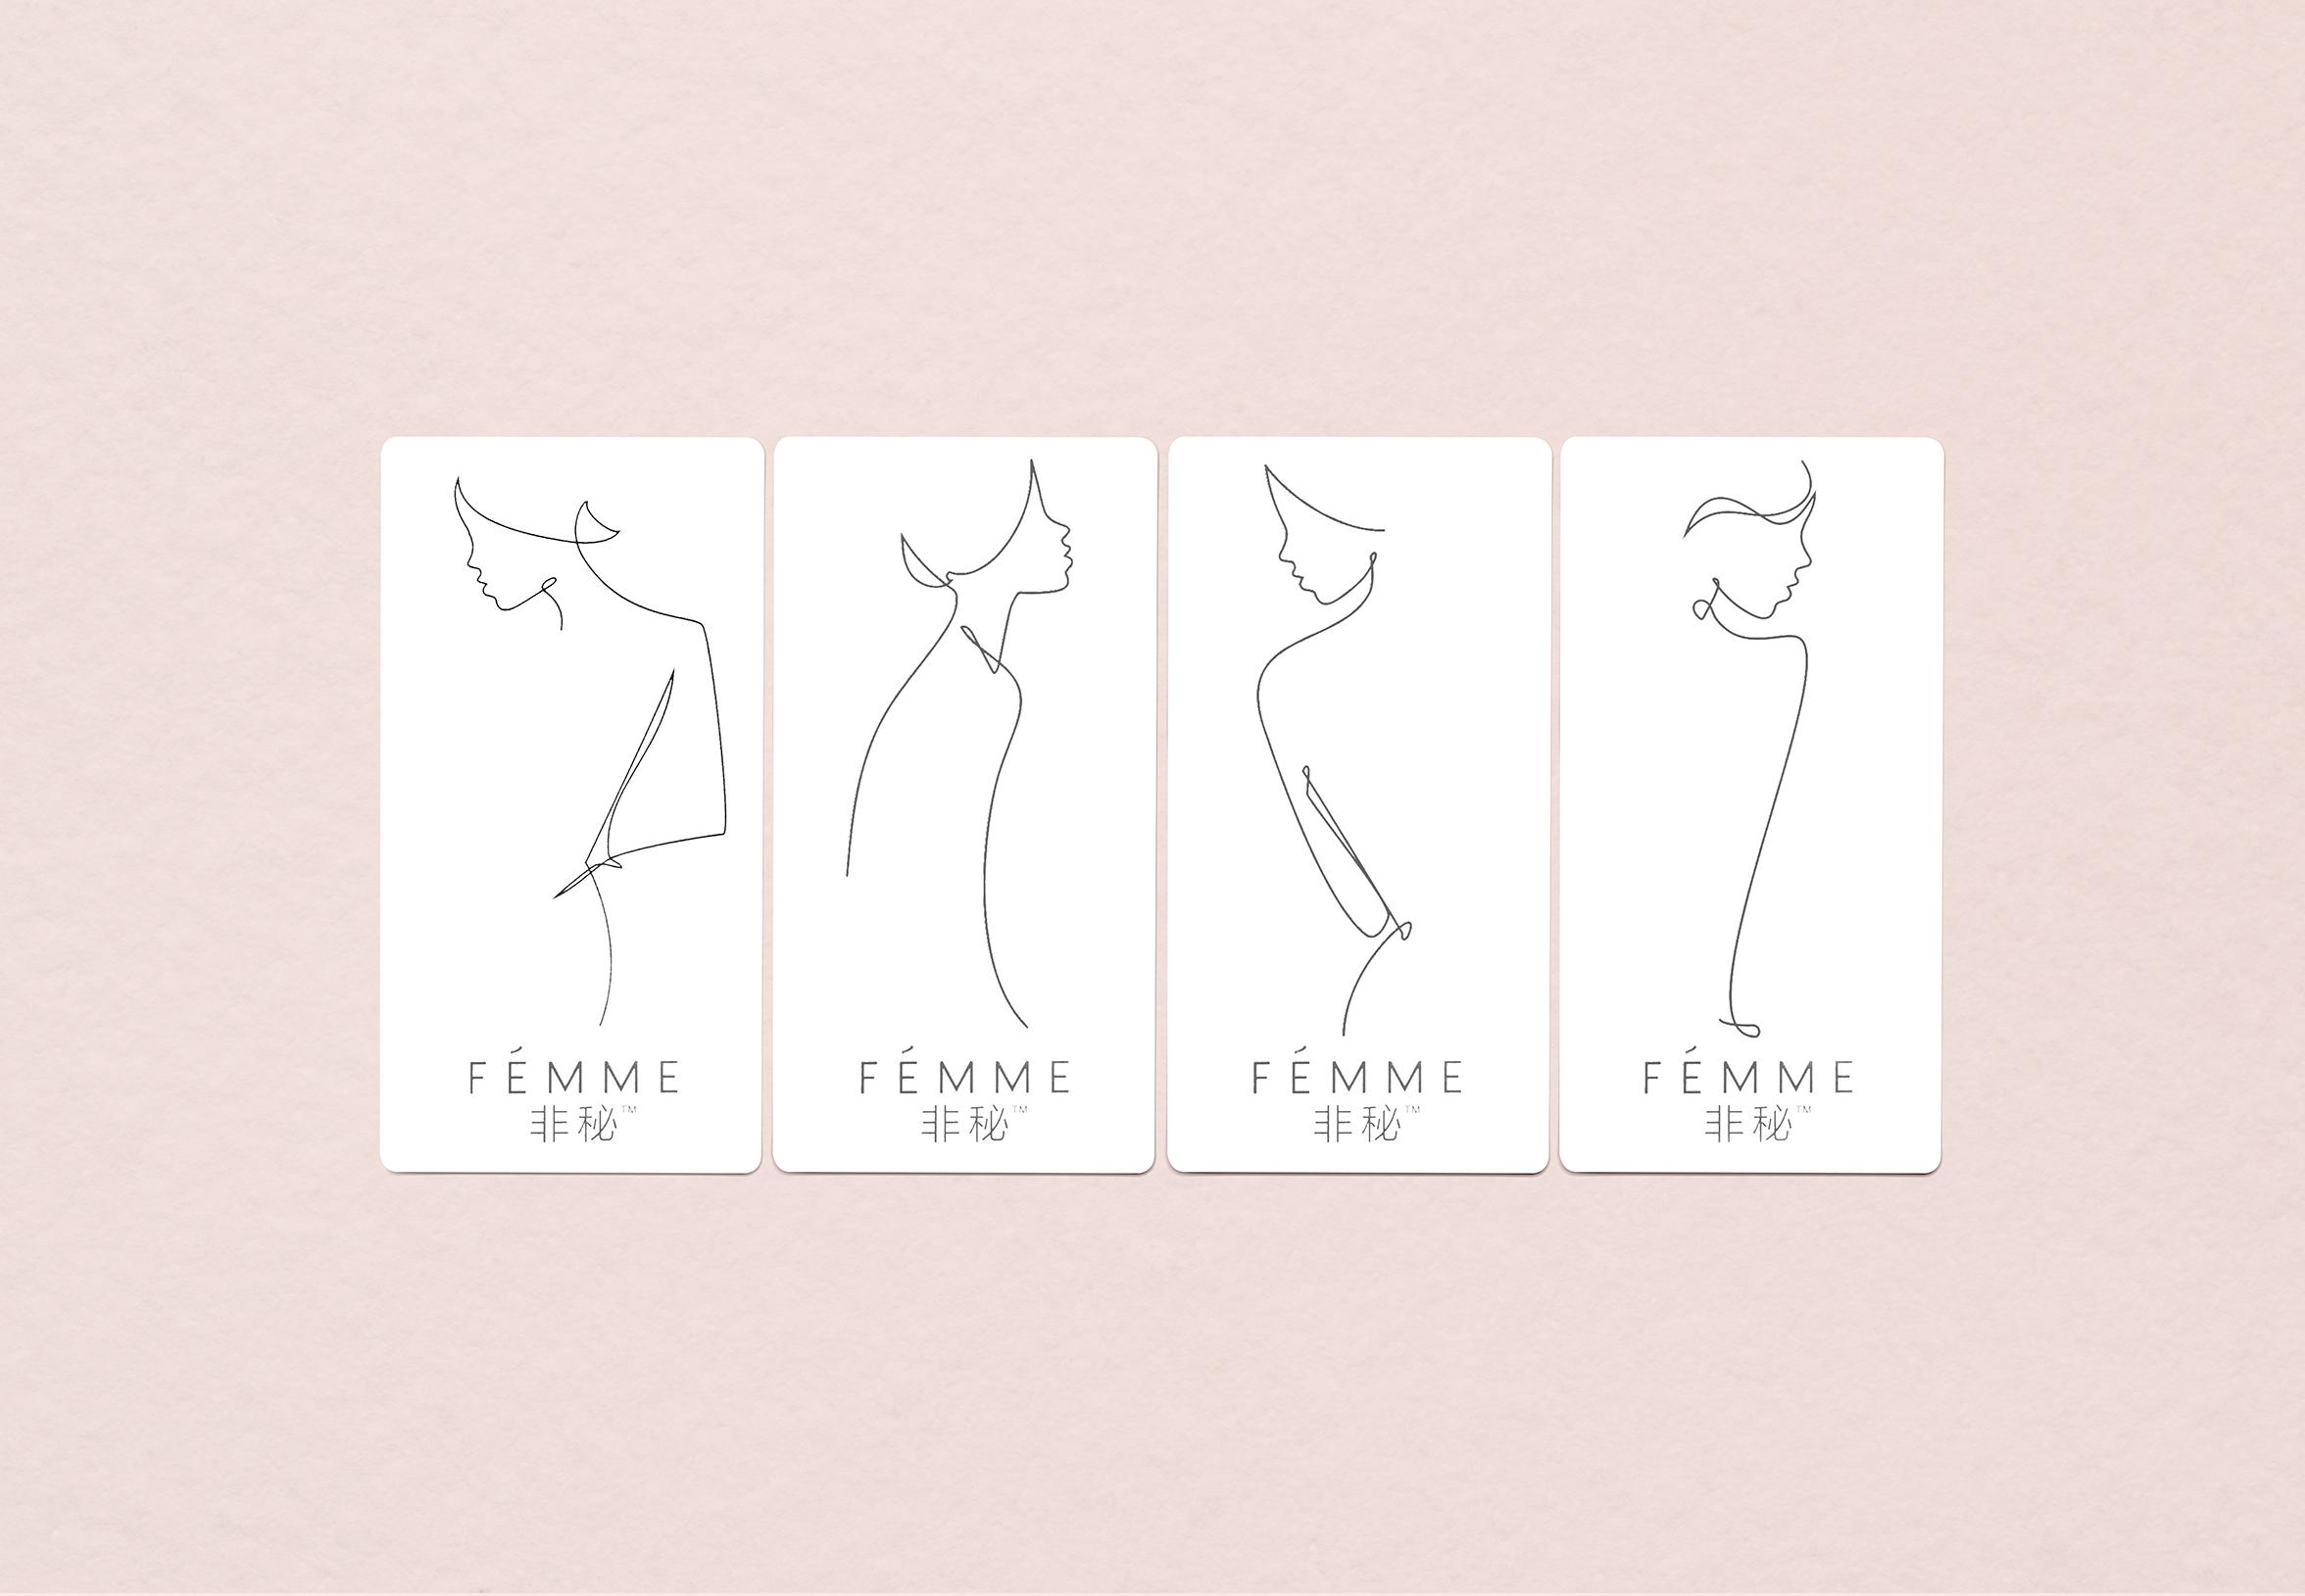 Femme_04